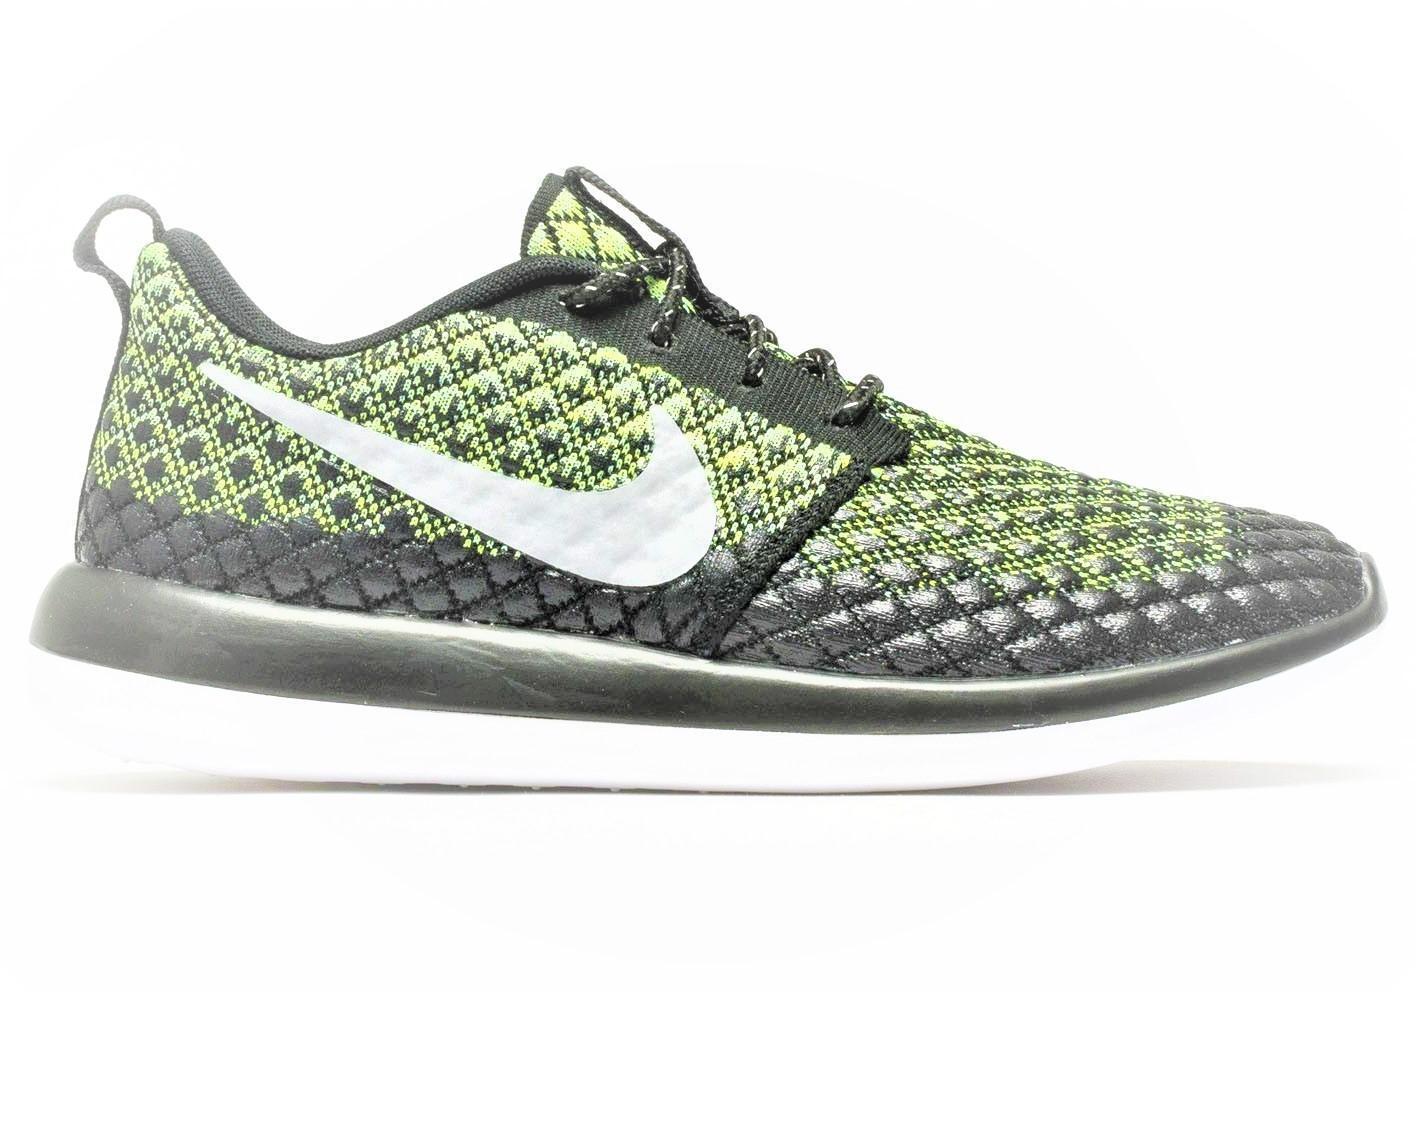 Herren Nike Roshe Zwei Flyknit 365 Schwarz Laufschuhe 859535 859535 859535 700 a9c14b